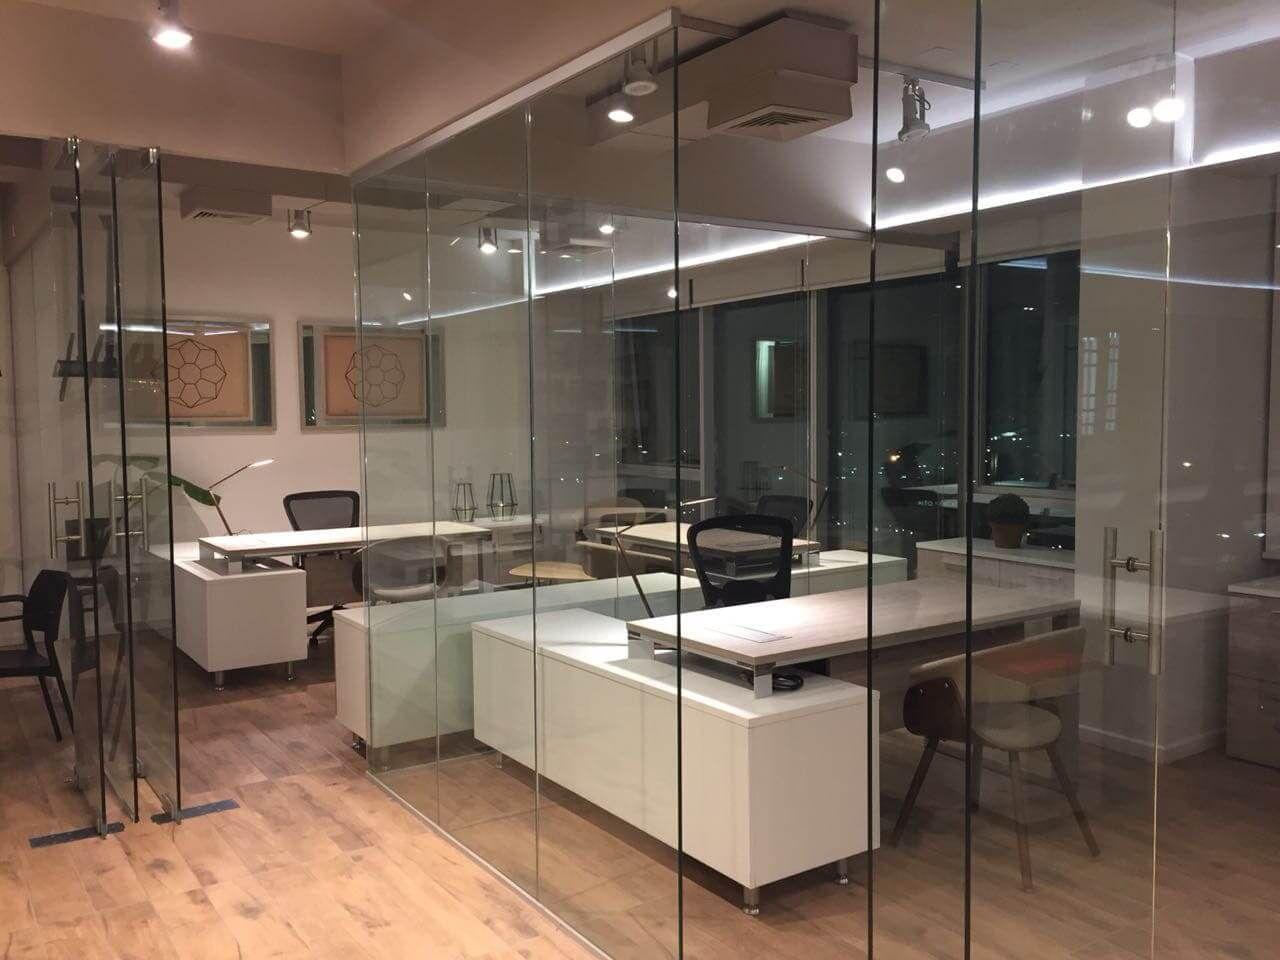 Tambo muebes de oficina escritorios Rancagua, Chile